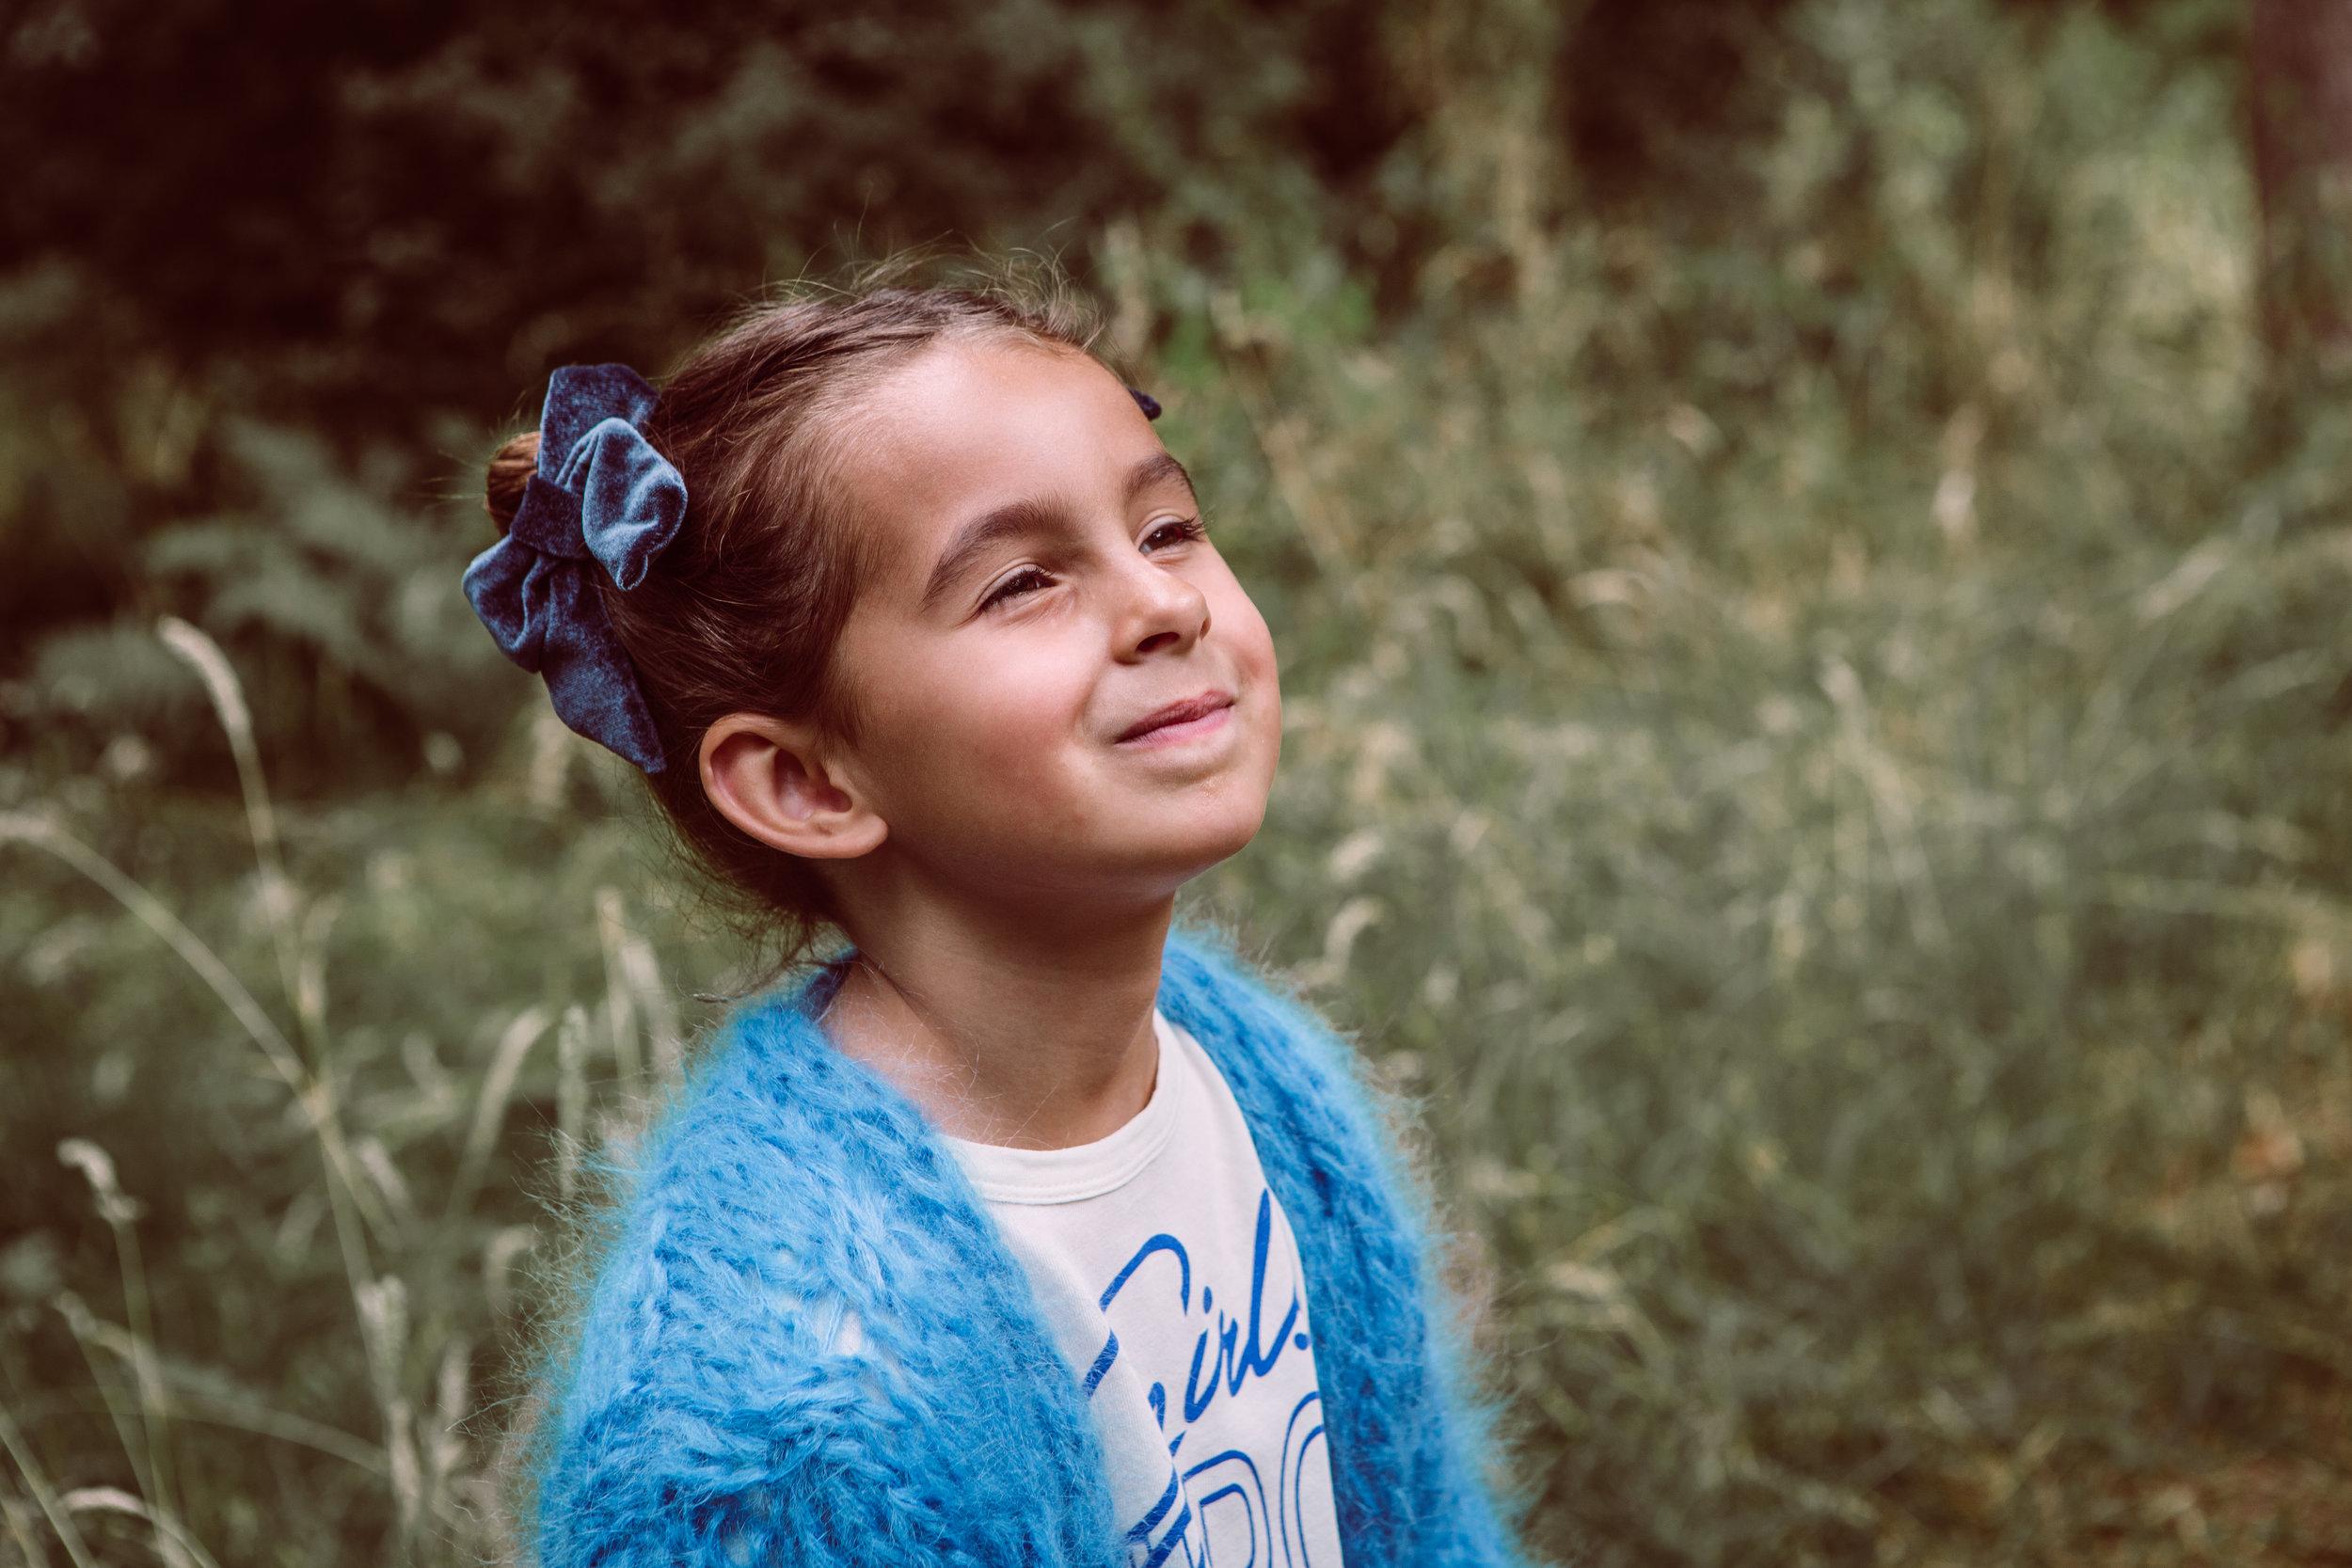 Alexa bows - knitwear Charlie Knits -  T-shirt Bellerose